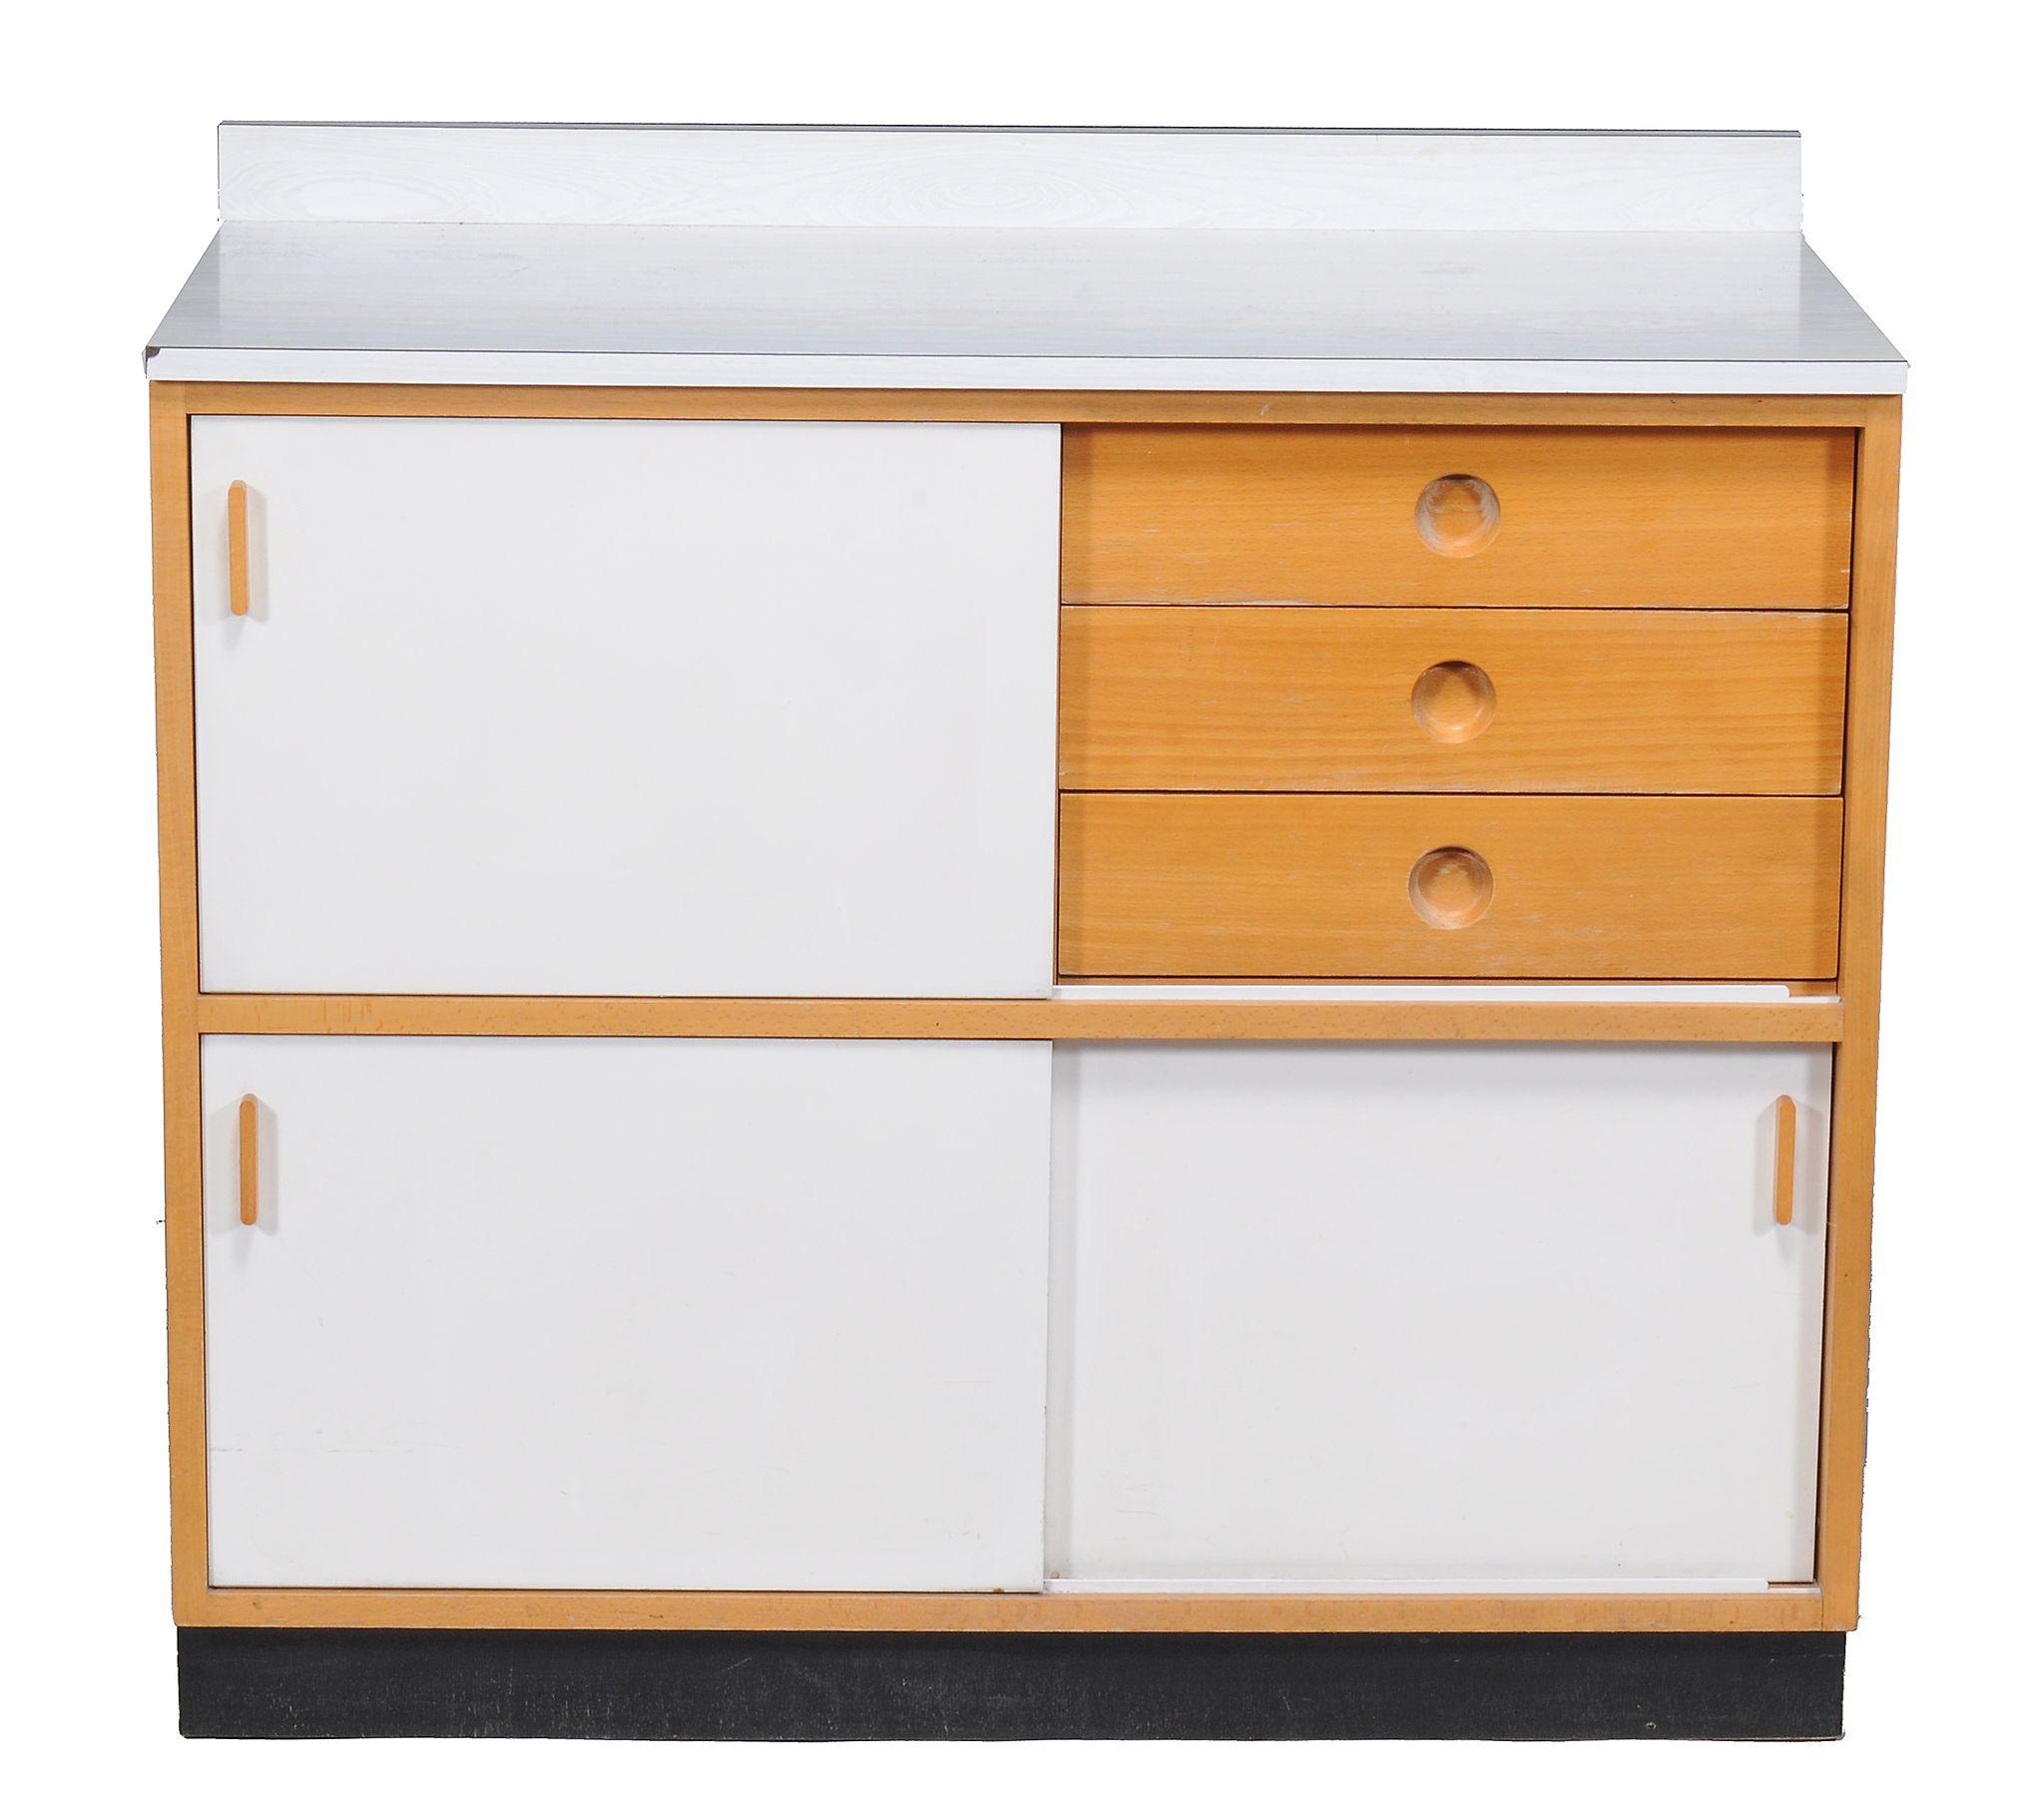 Frank guille for kandya ltd trimma kitchen cabinets for A one kitchen cabinets ltd